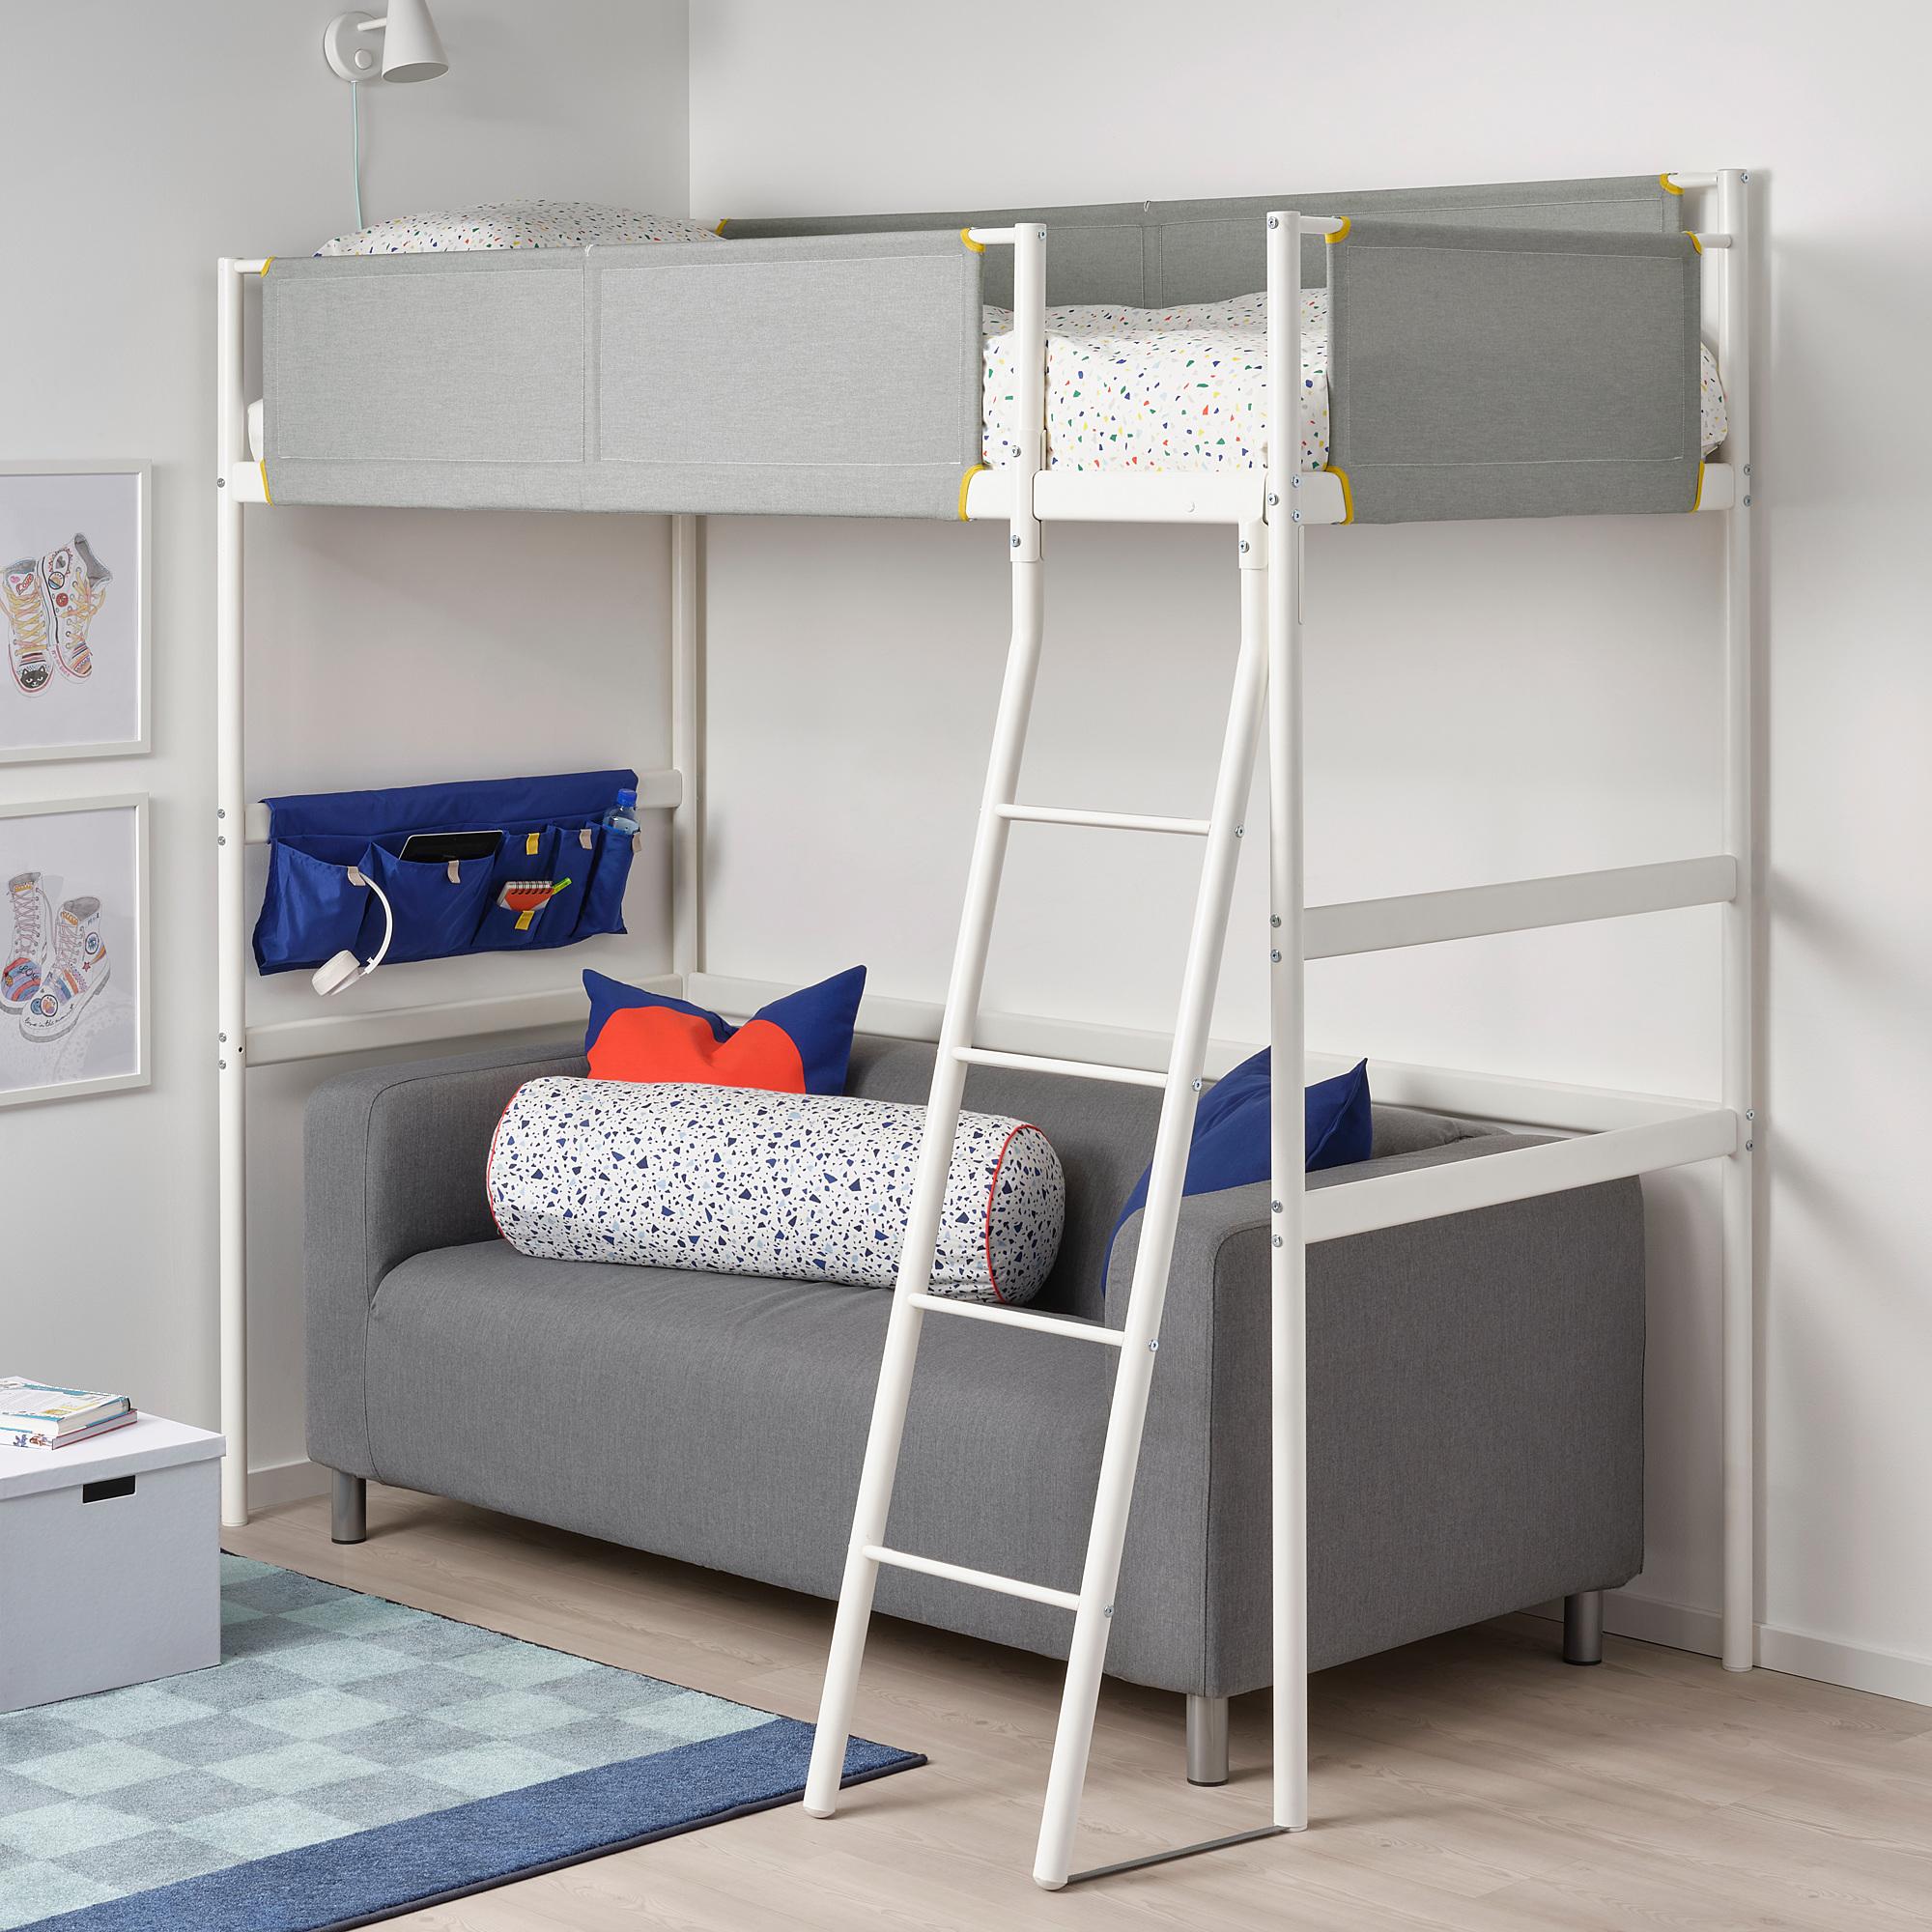 Bed Bertingkat Ikea Dengan Ruang Terbuka